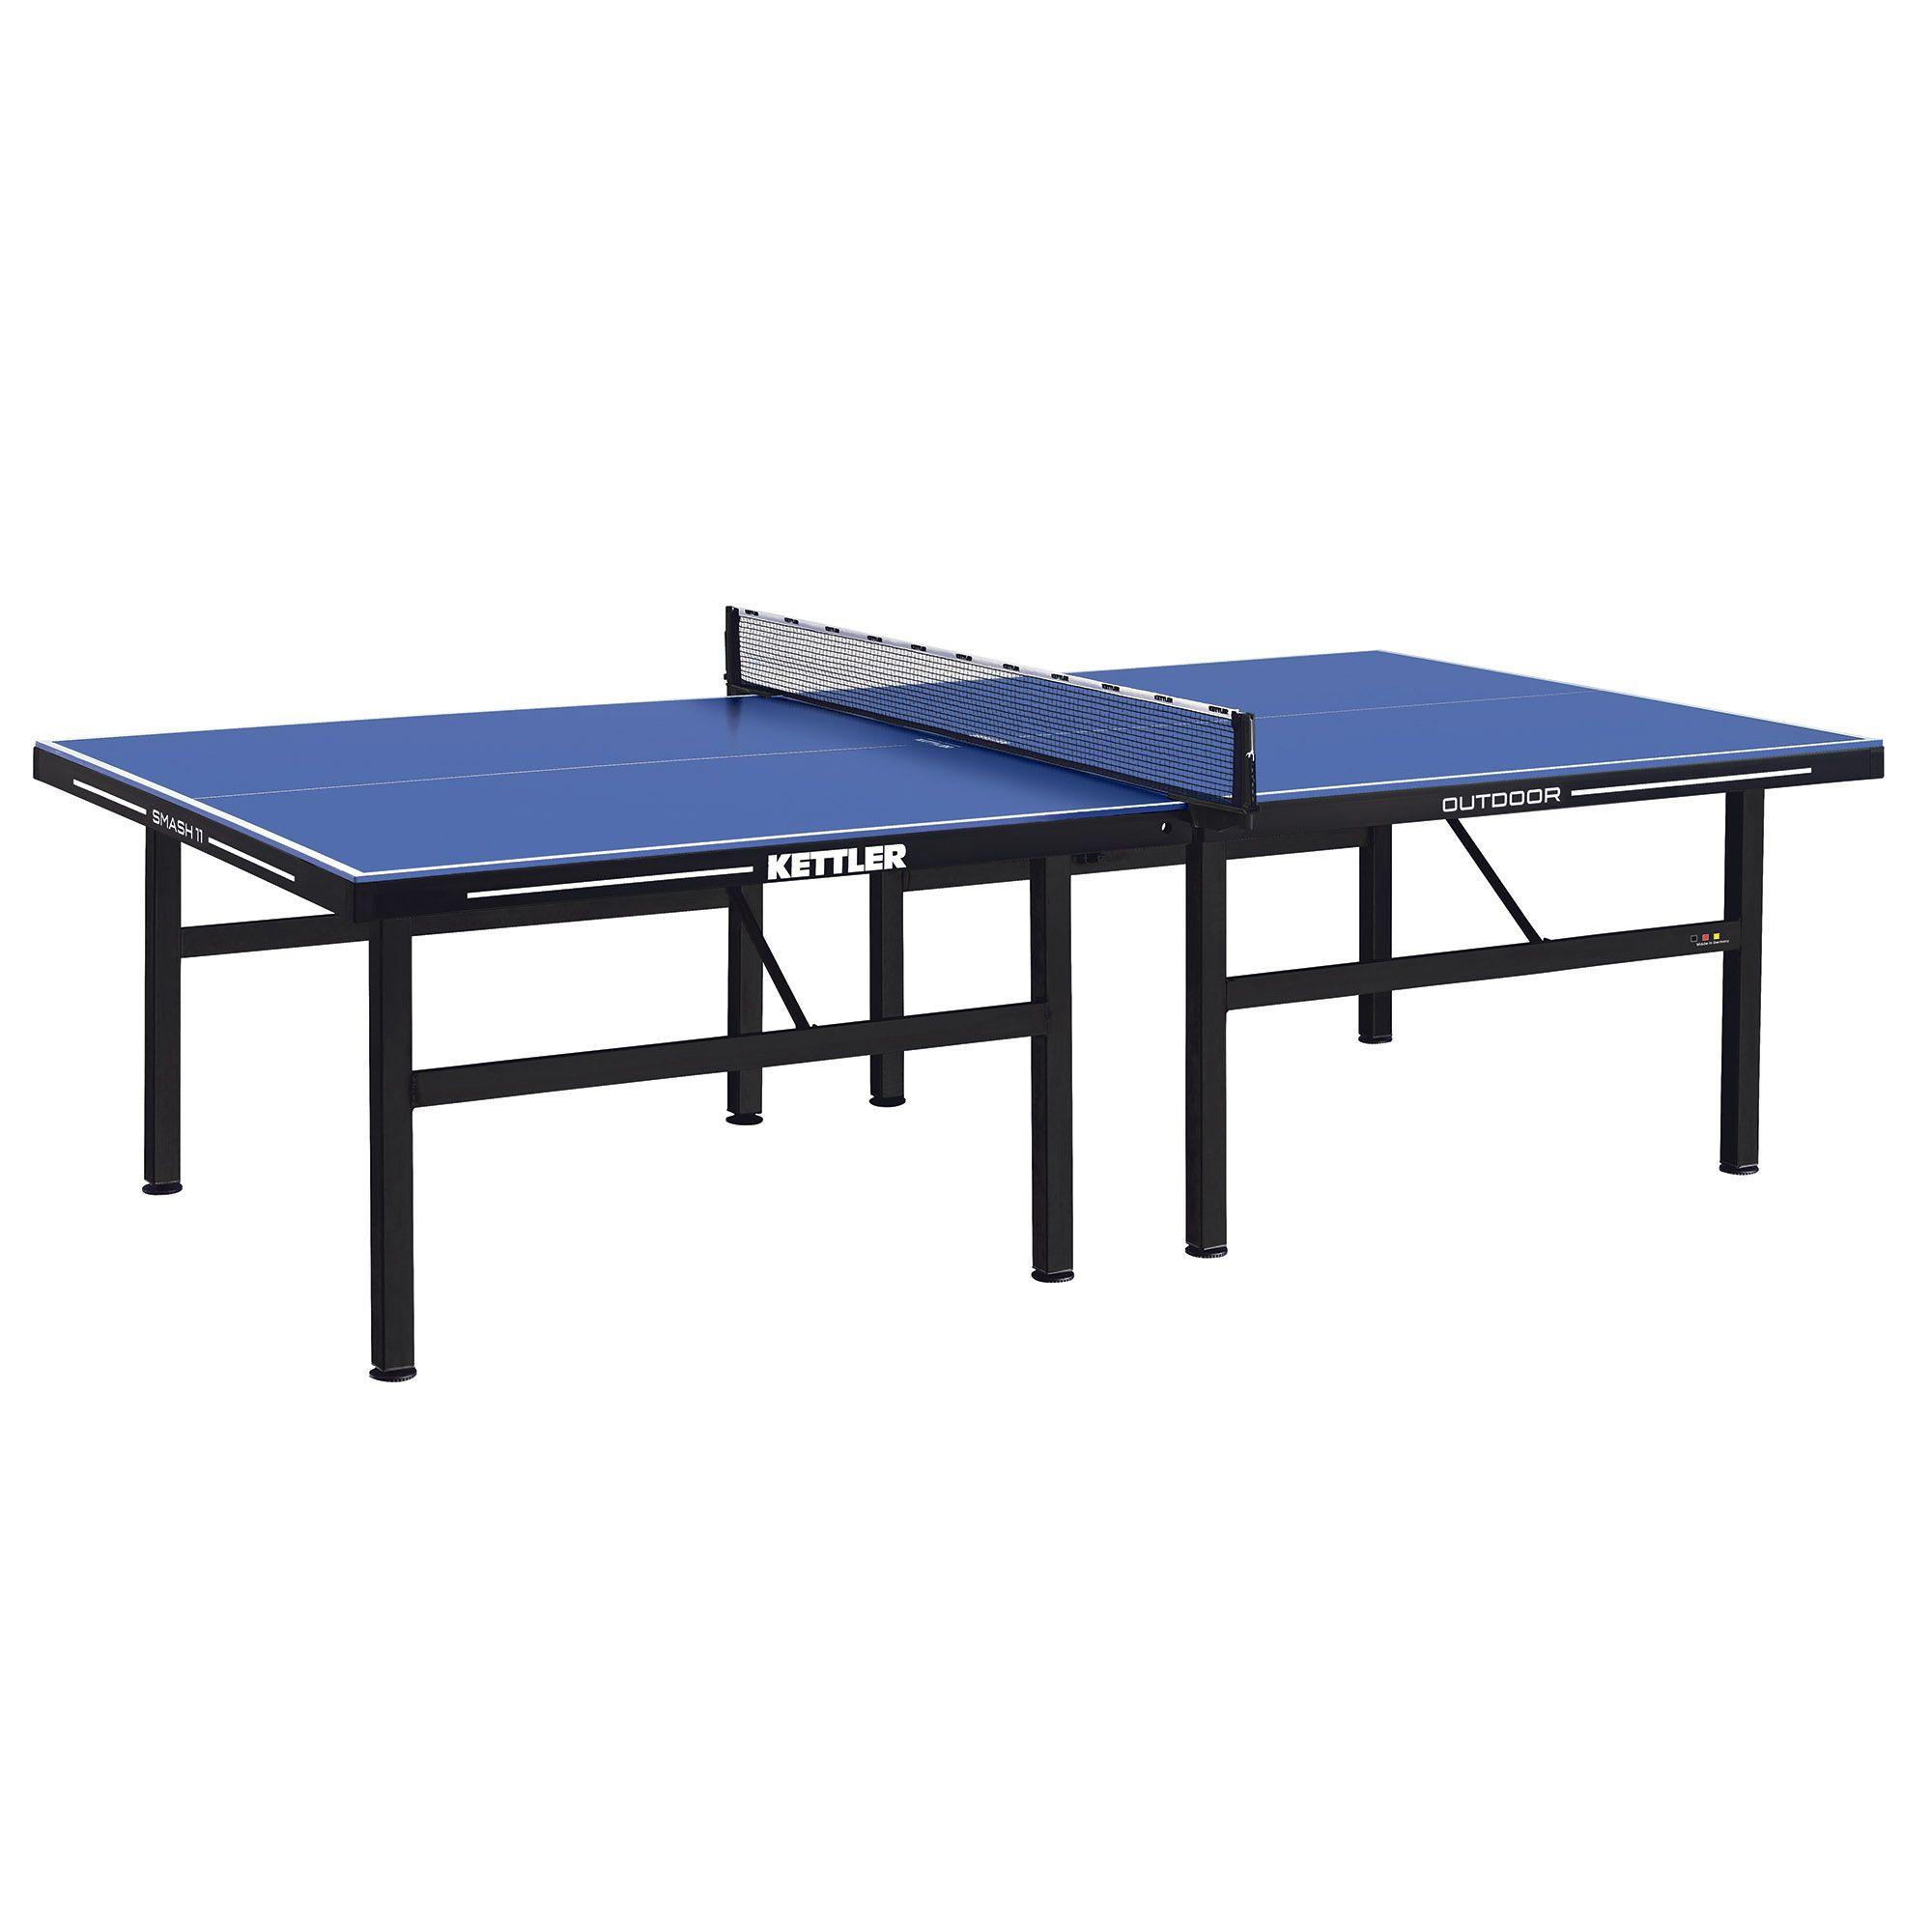 Kettler Smash 11 0 Outdoor Table Tennis Table Sweatband Com